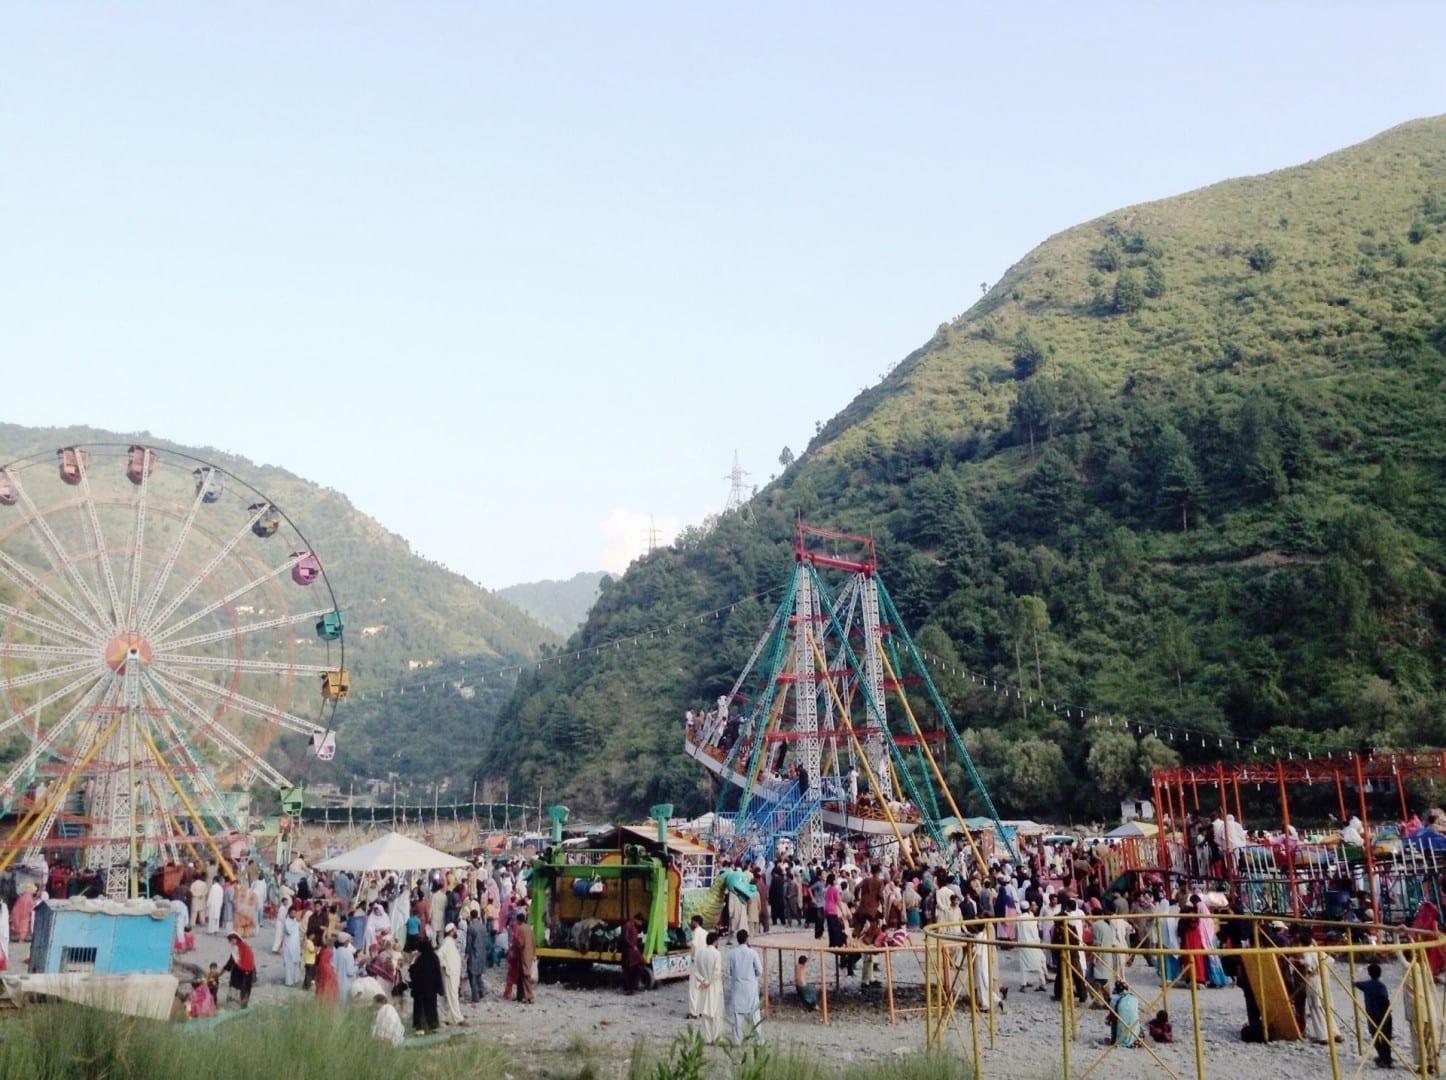 'Harnoi', un famoso lugar de picnic a 10 km de la ciudad. Abbottabad Pakistán